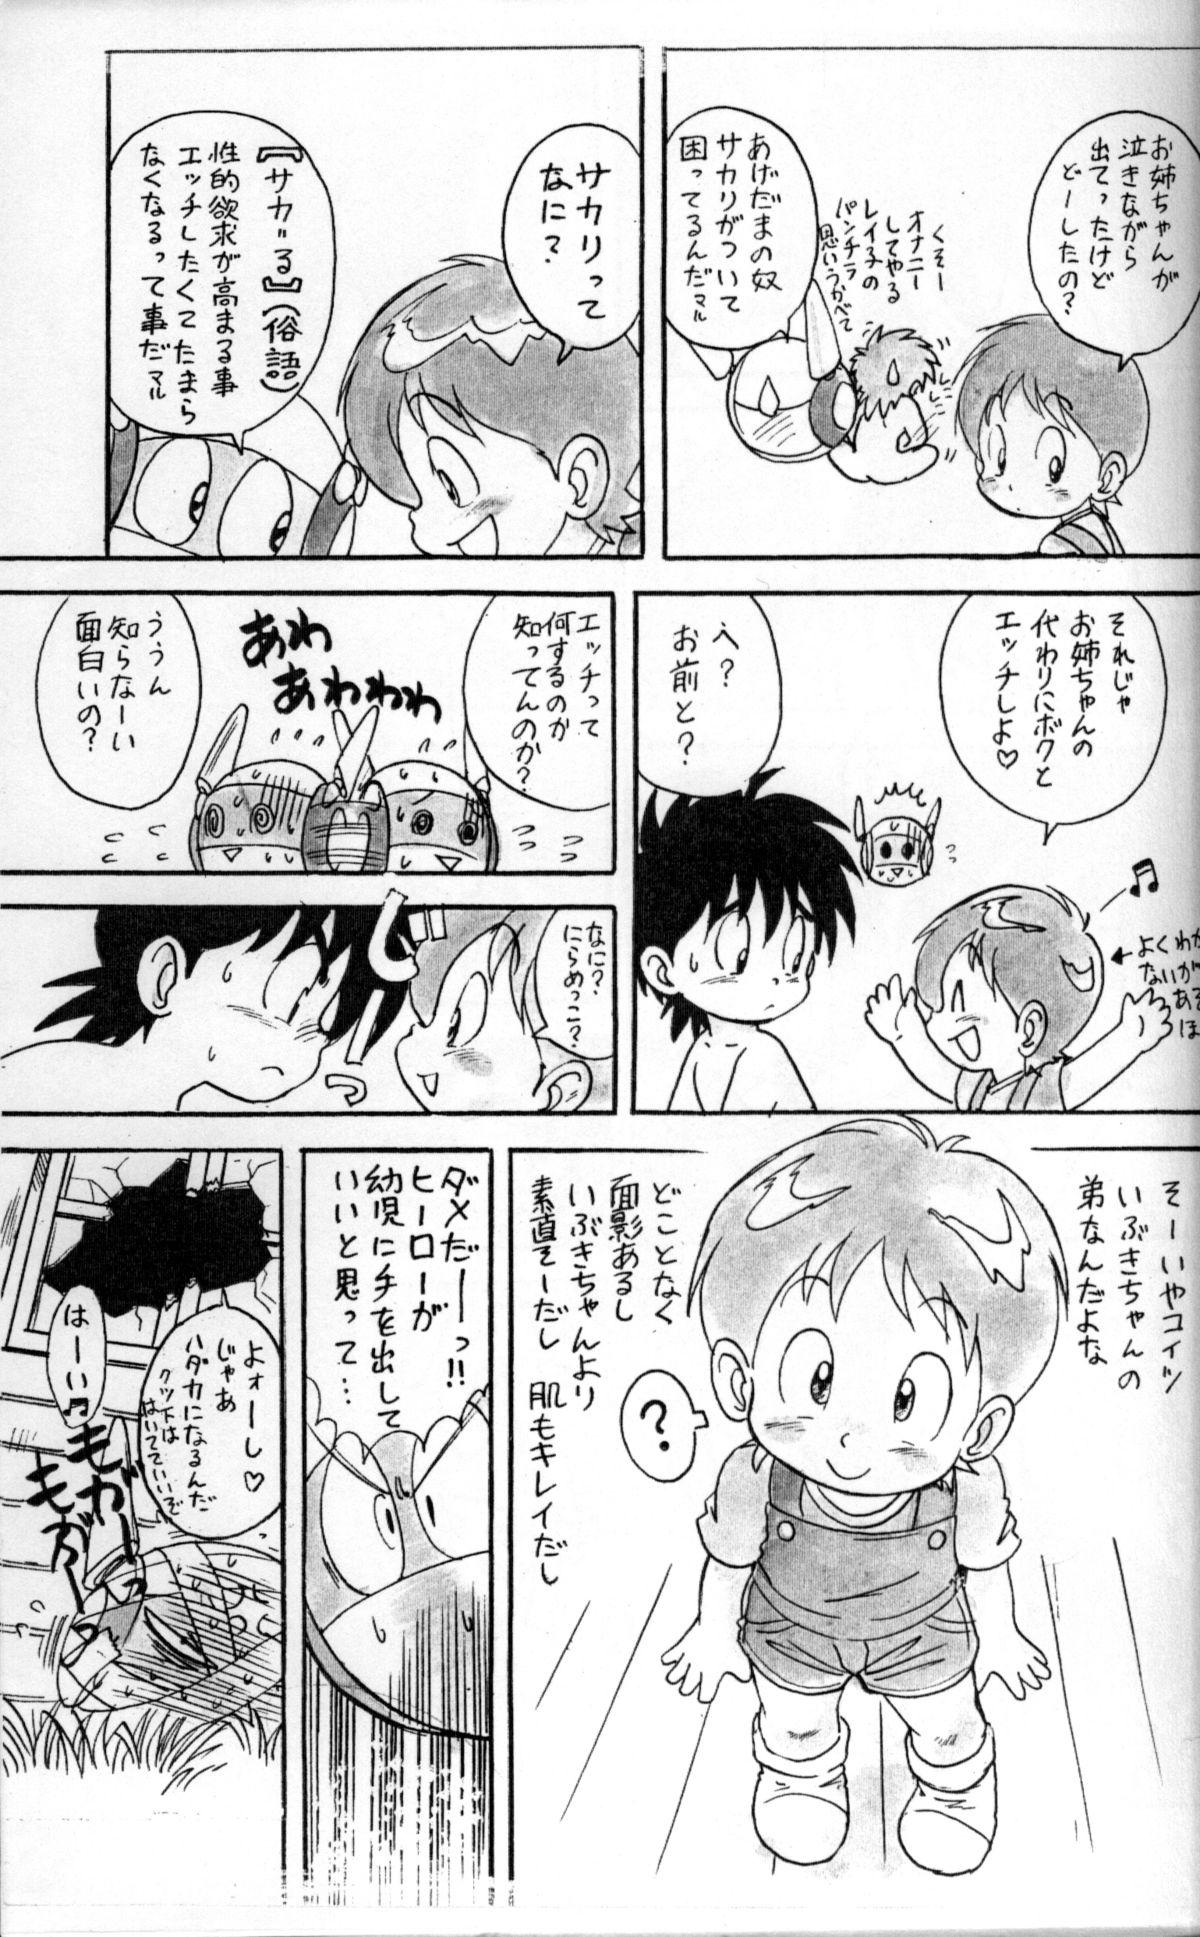 Mitsui Jun - Dreamer's Only - Anime Shota Character Mix 9